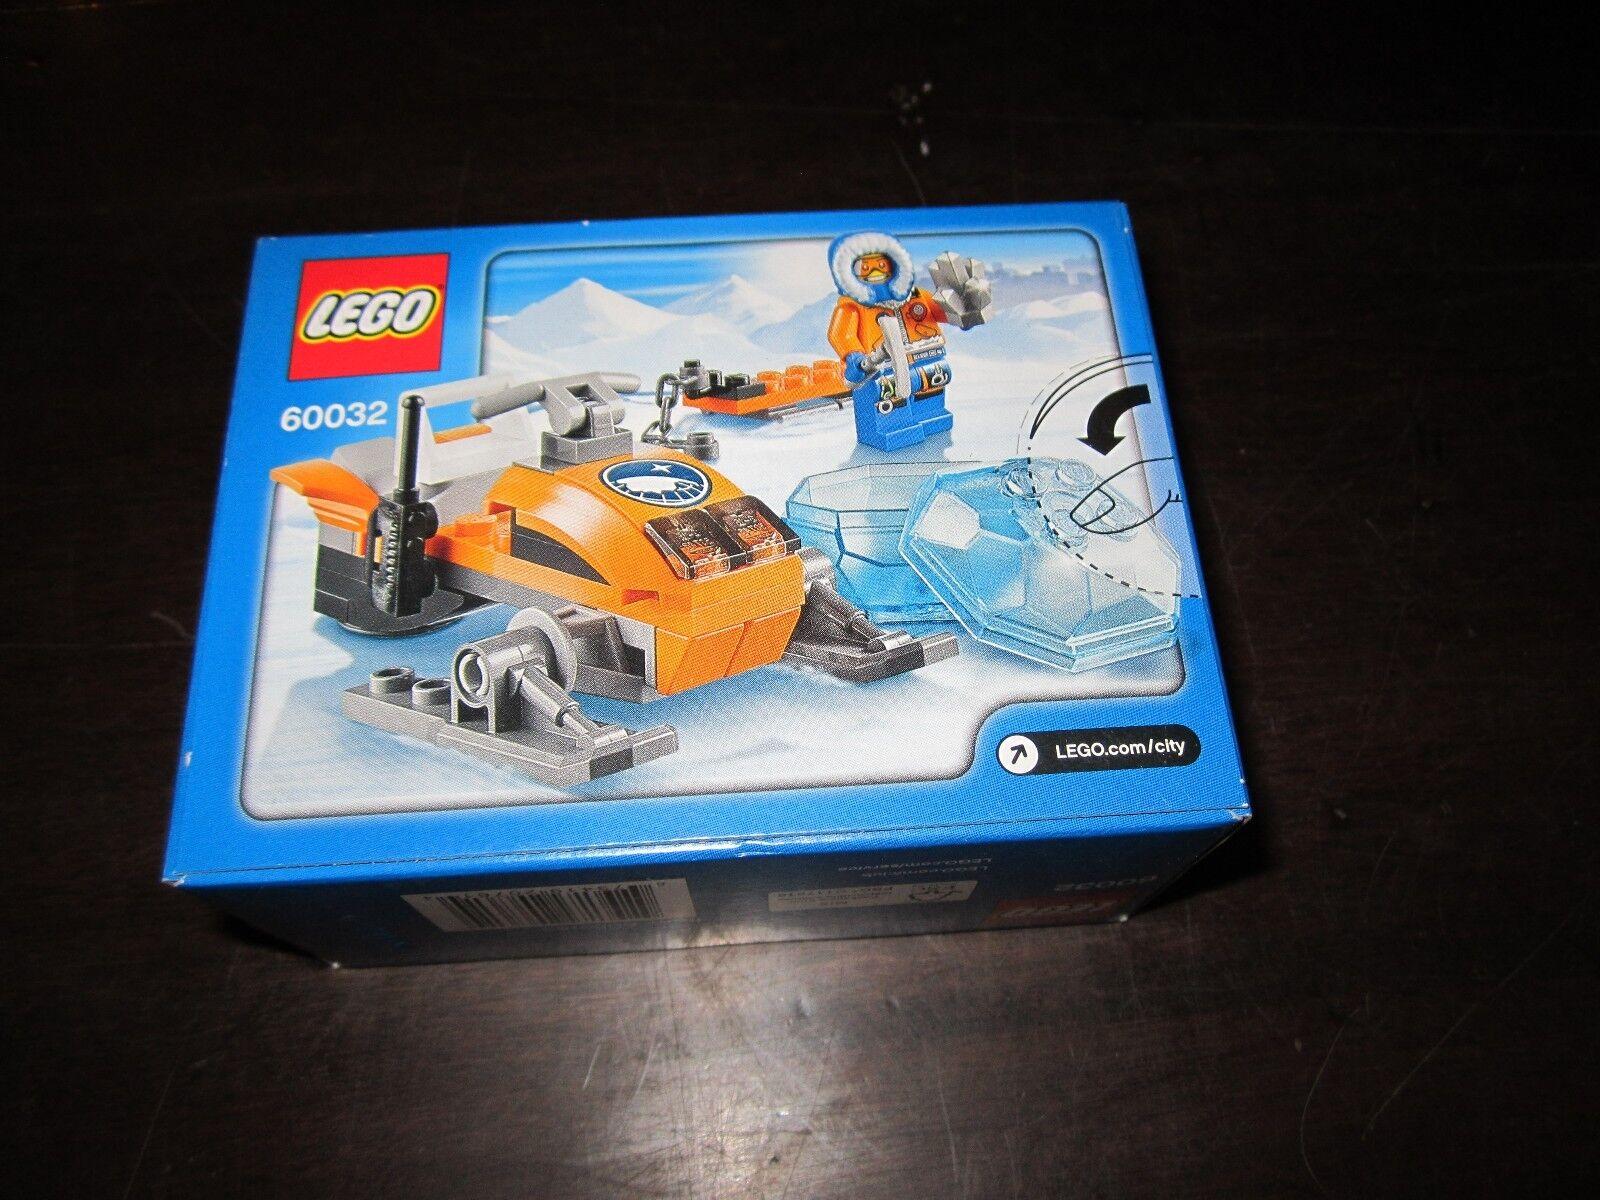 Lego City NEUF 60032 Arctic Ice Crawler Crane  ICE LIFT Building Toy  sports chauds